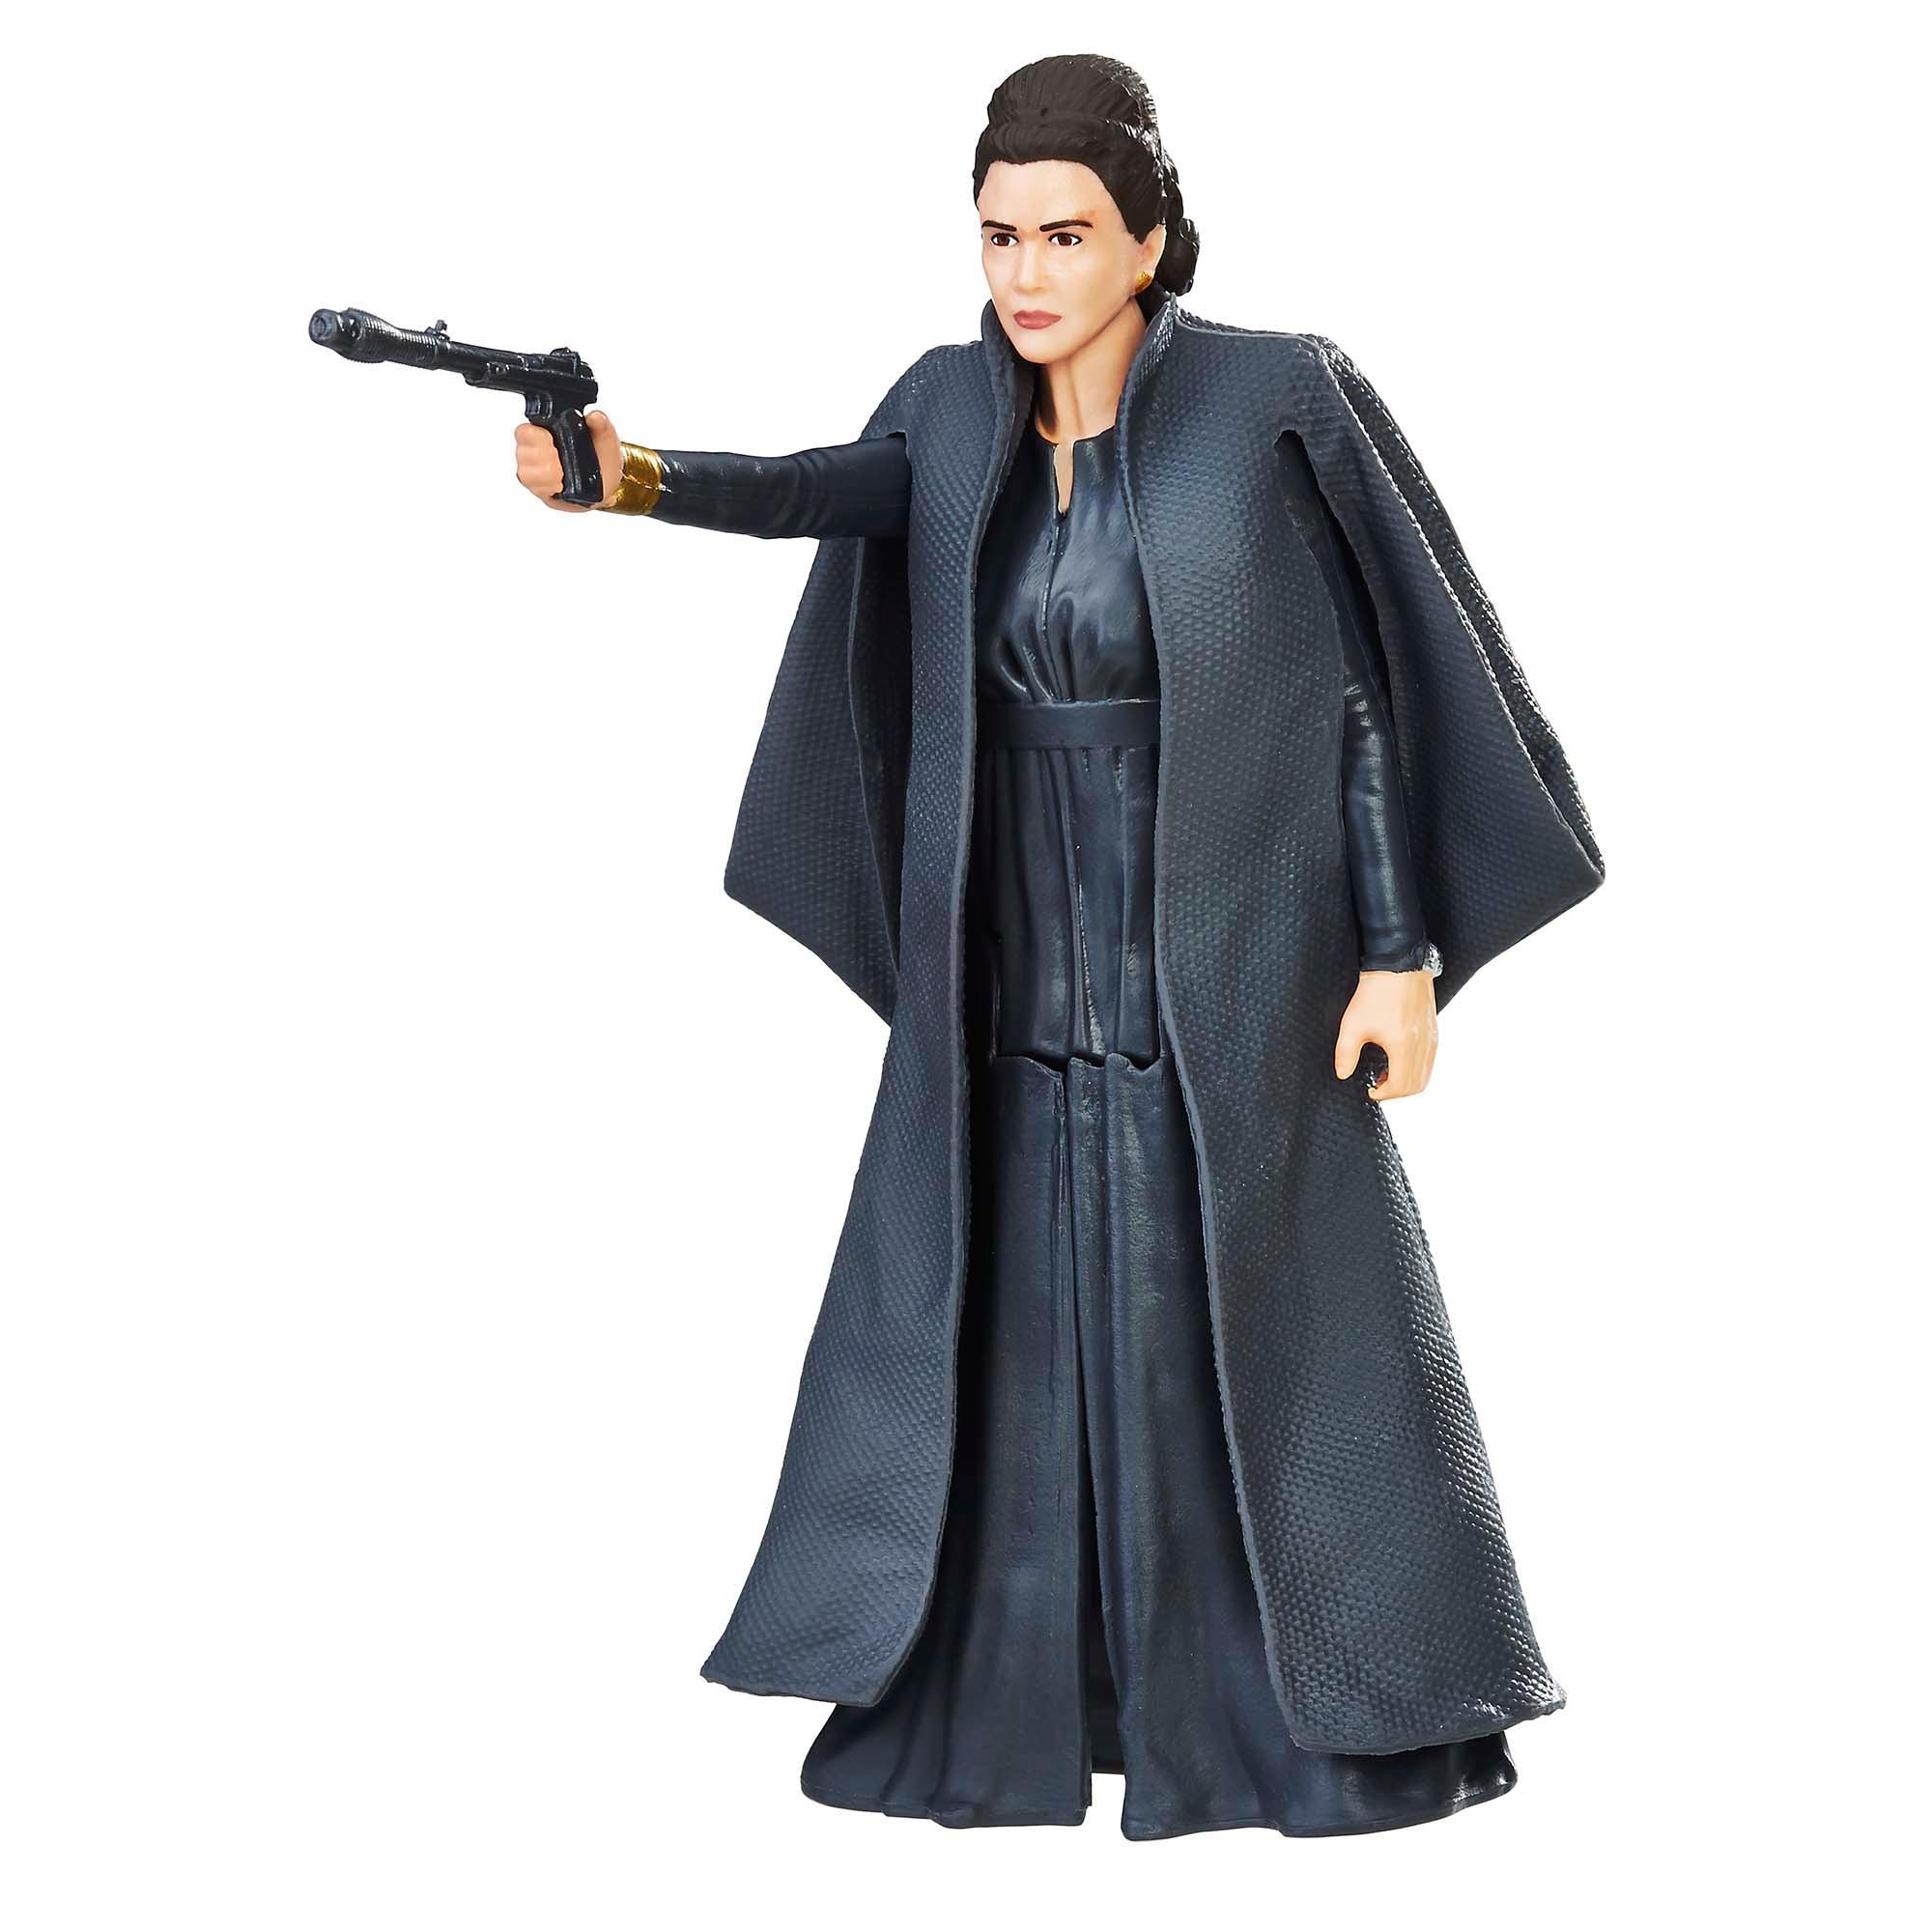 Star Wars - General Leia Organa com Force Link